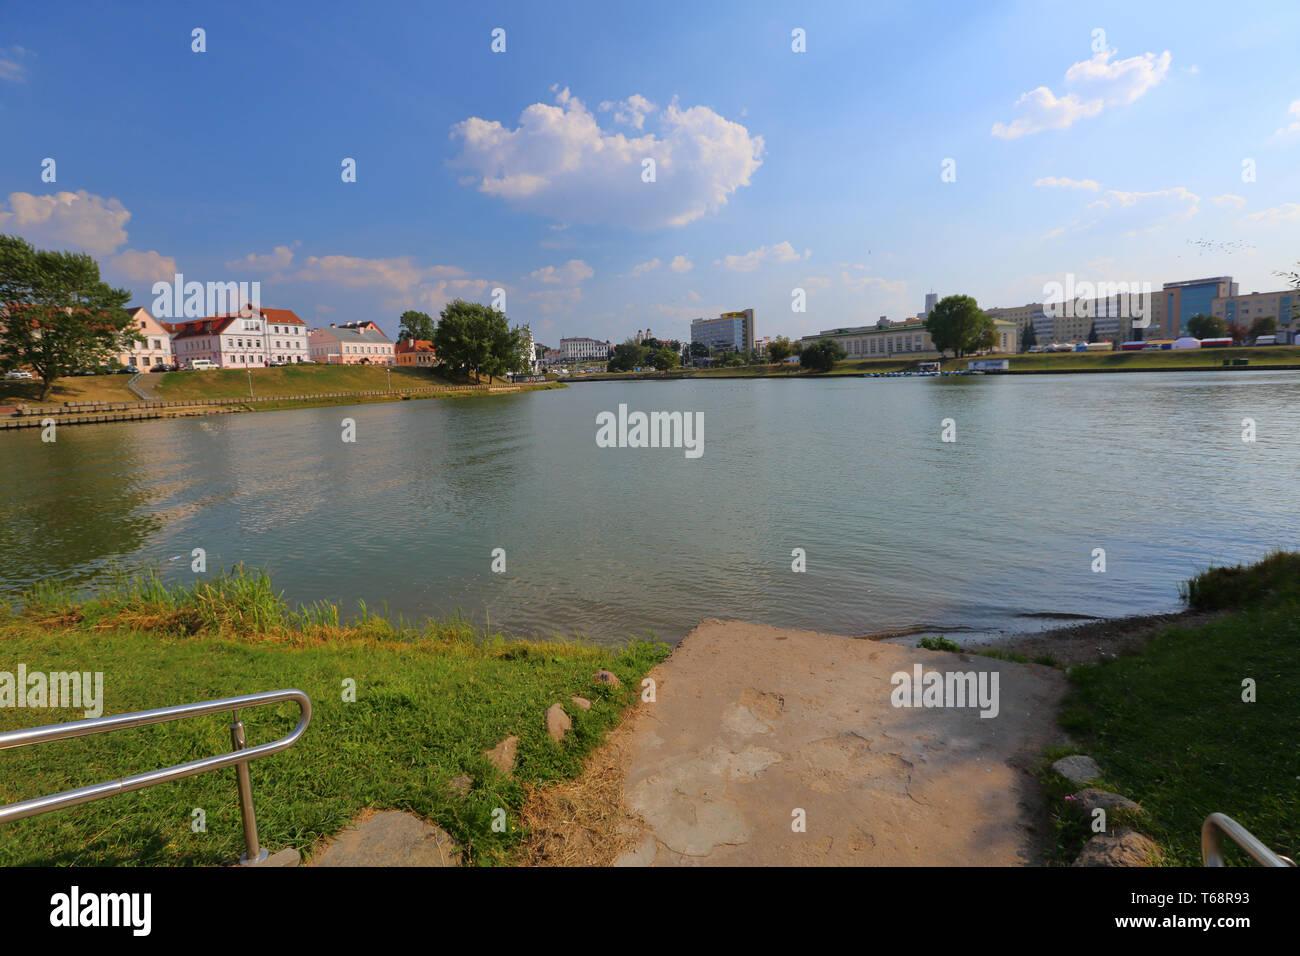 The city of Minsk, Belarus - Stock Image